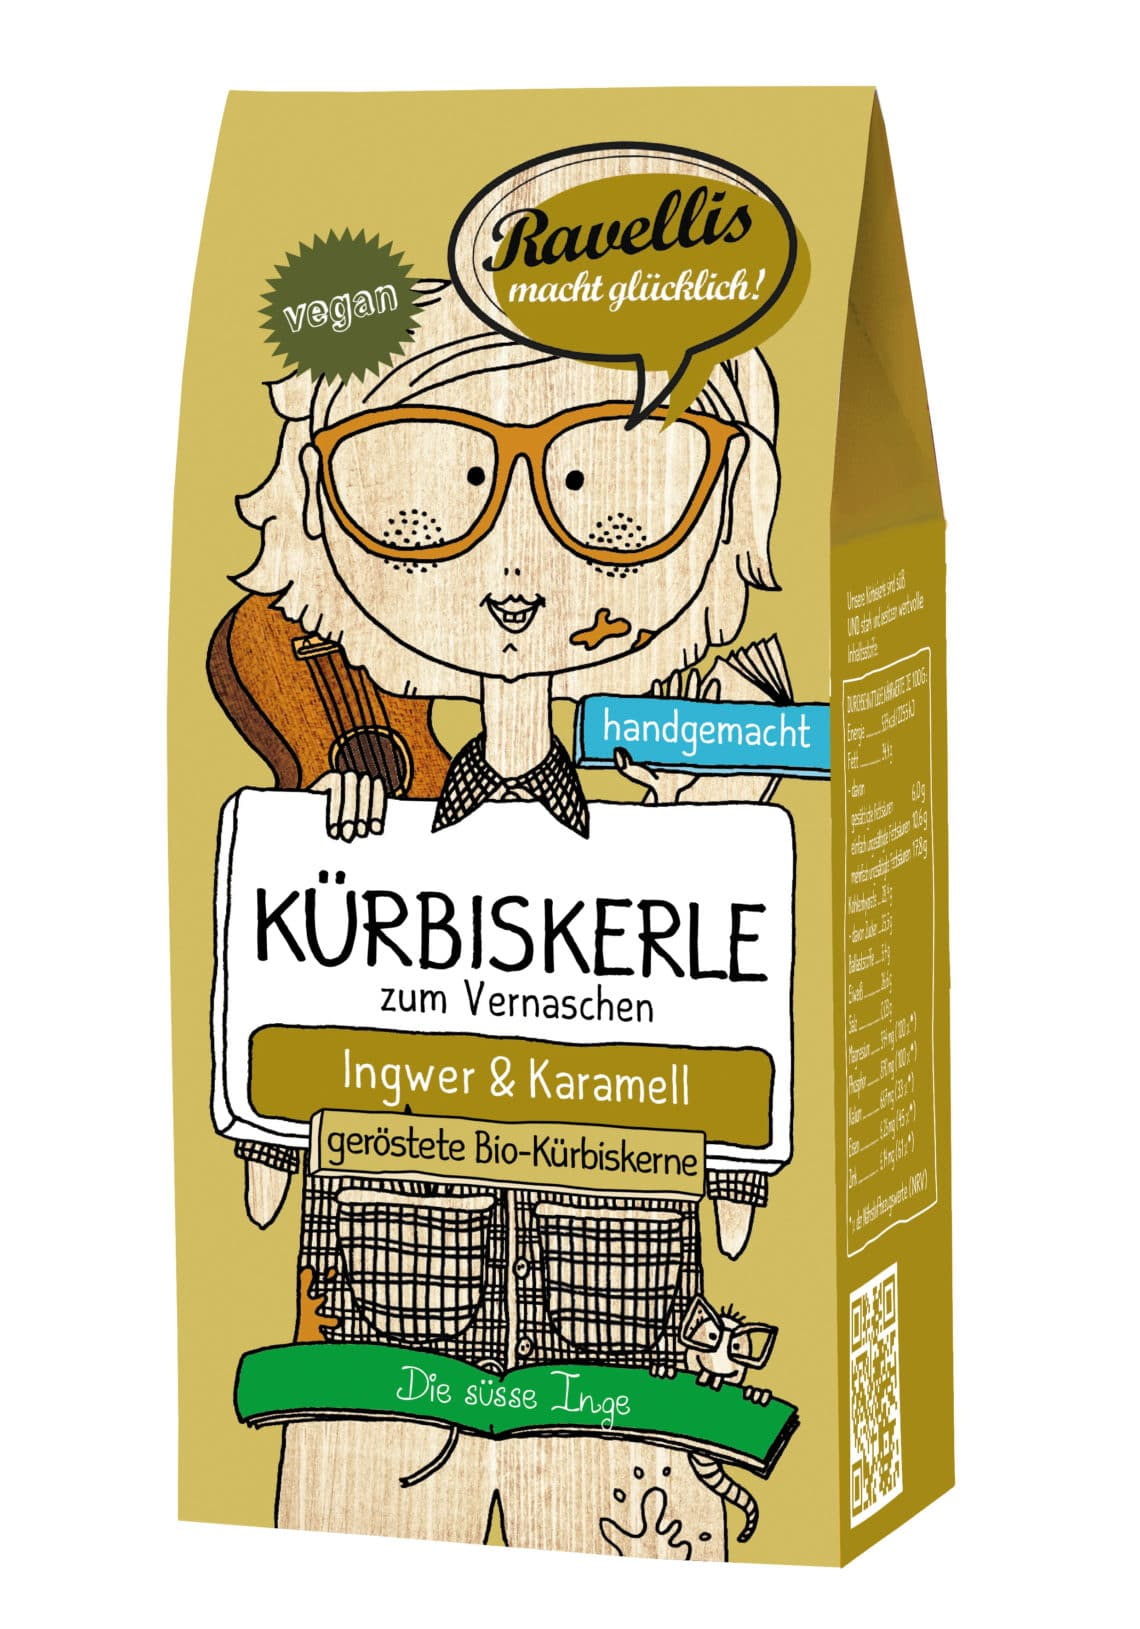 Ingwer & Karamell